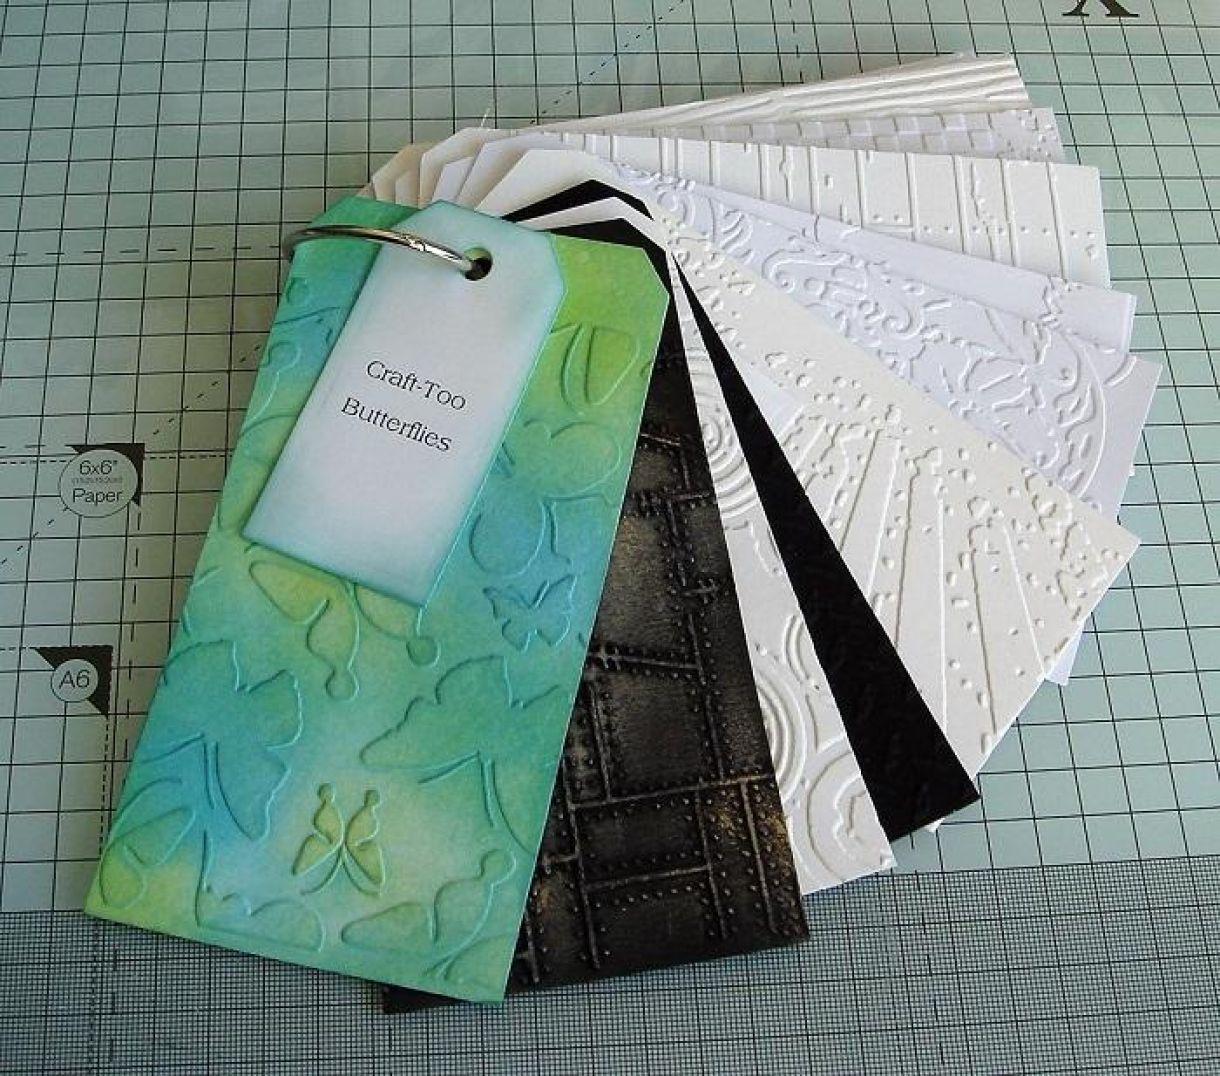 Embossing Folder Organiser Tag Book 6